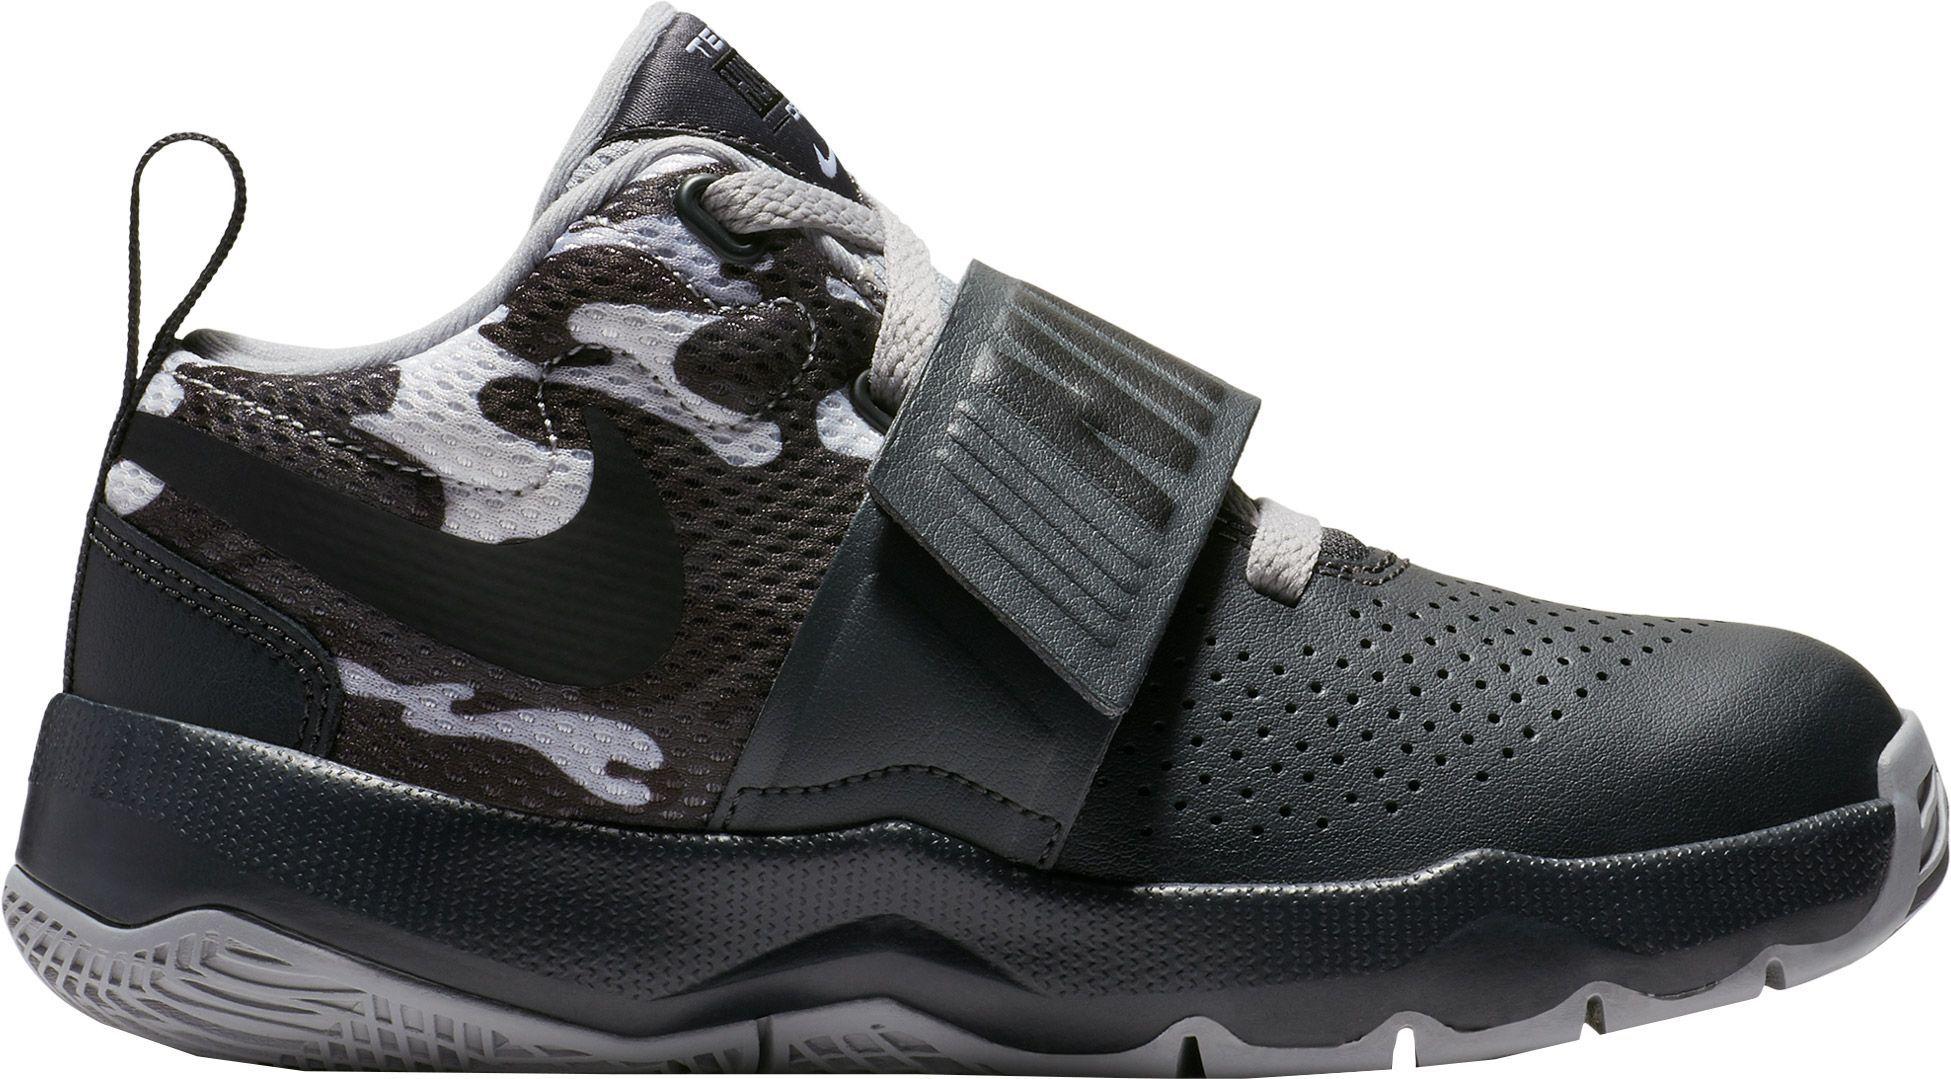 san francisco c2f8d e05e5 Nike Kids  Preschool Team Hustle D 8 Camo Basketball Shoes, Size  2.0, Gray